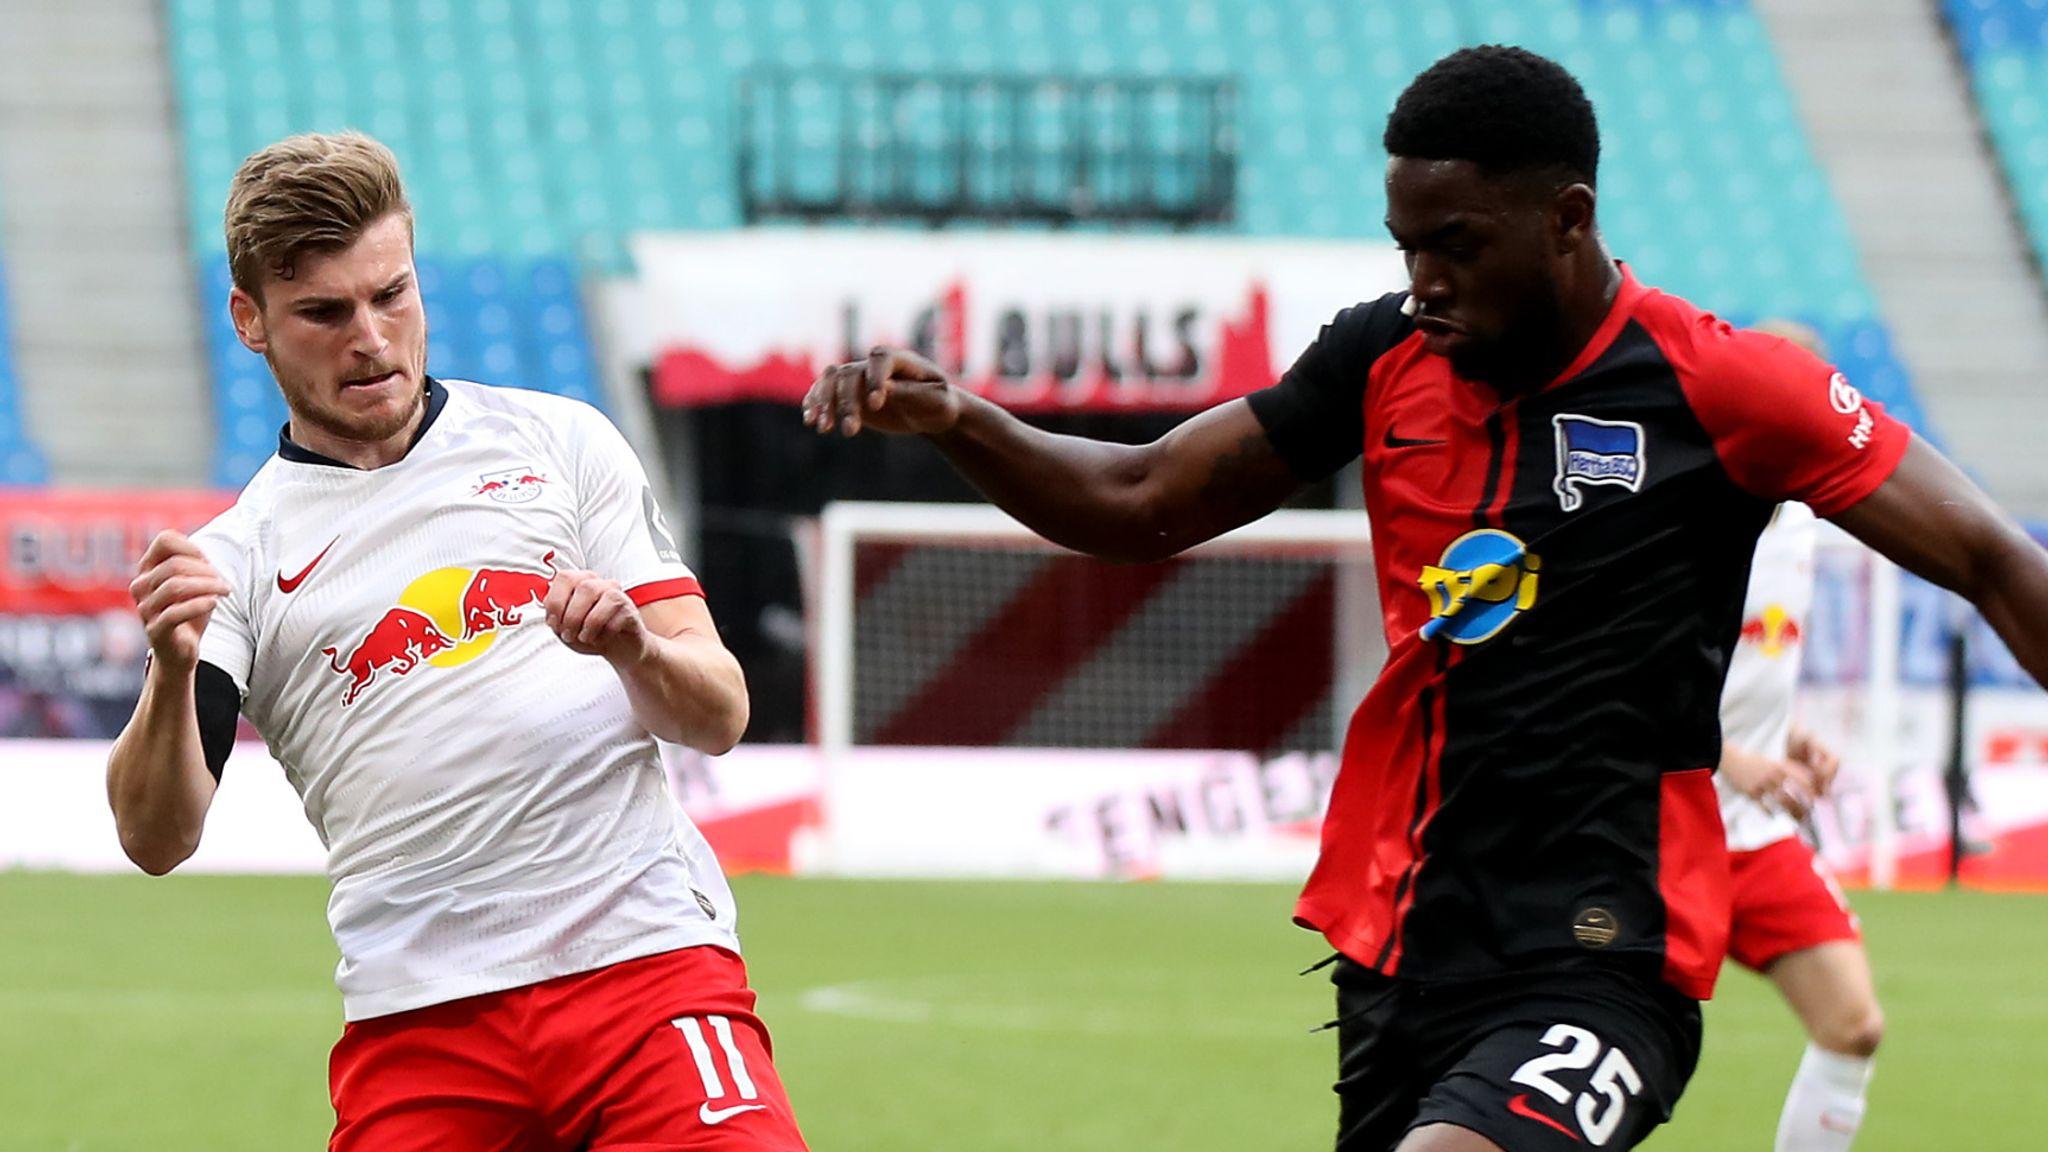 RB Leipzig 2-2 Hertha Berlin: Krzysztof Piatek penalty denies Leipzig second spot